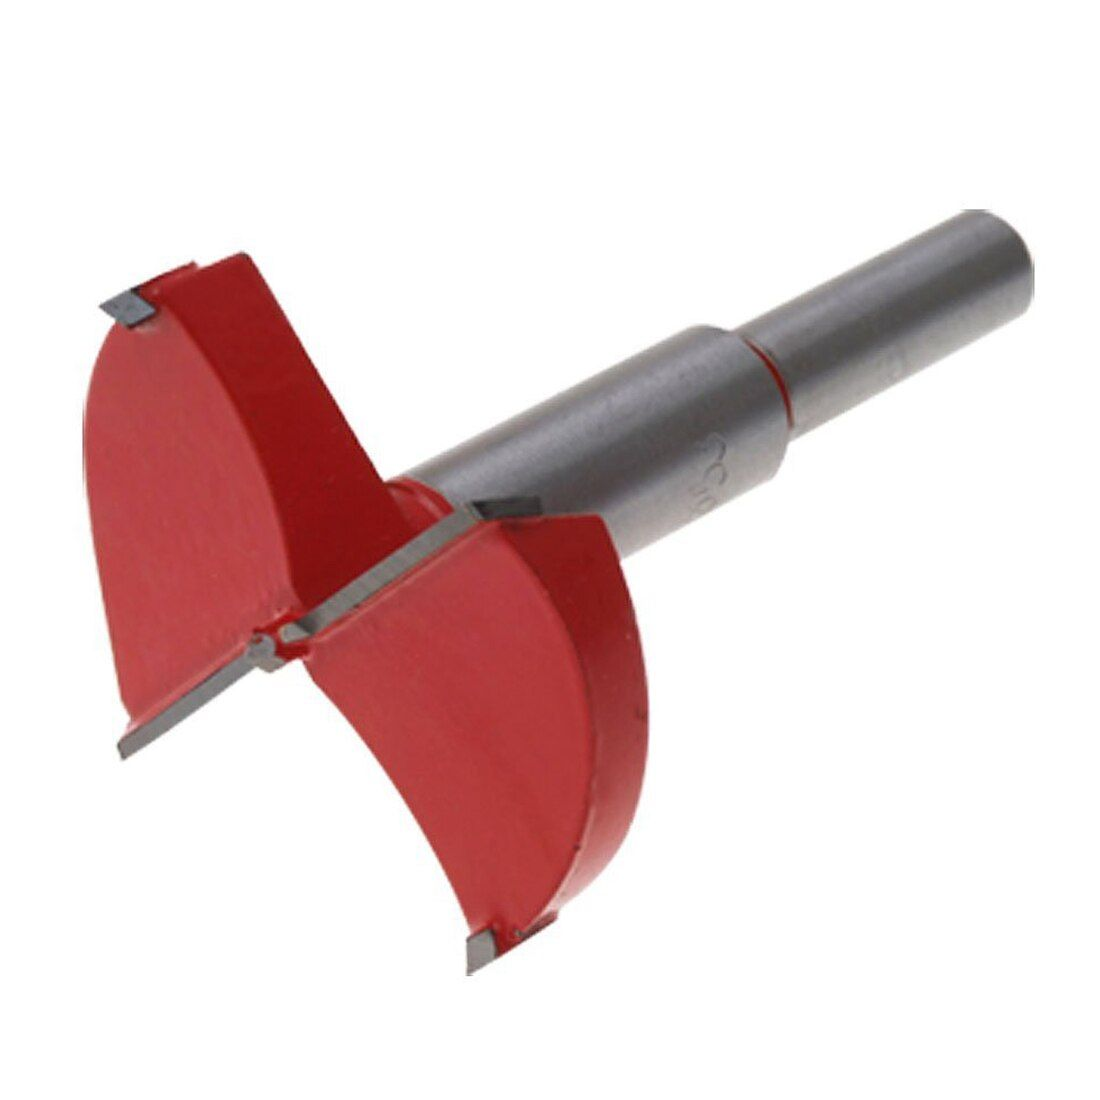 Neue 53mm rot metall holz bohrer werkzeug